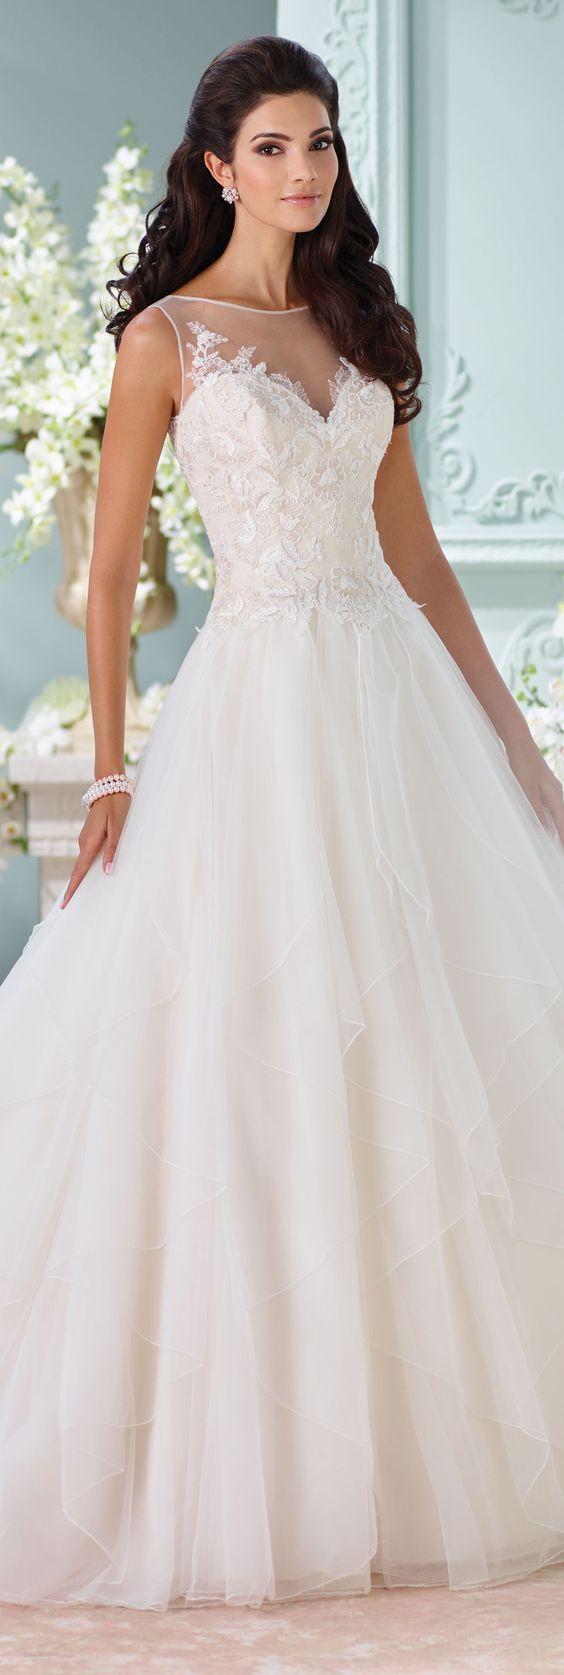 The David Tutera for Mon Cheri Spring 2016 Wedding Gown Collection - Style No. 116221 Adena #ballgownweddingdress: